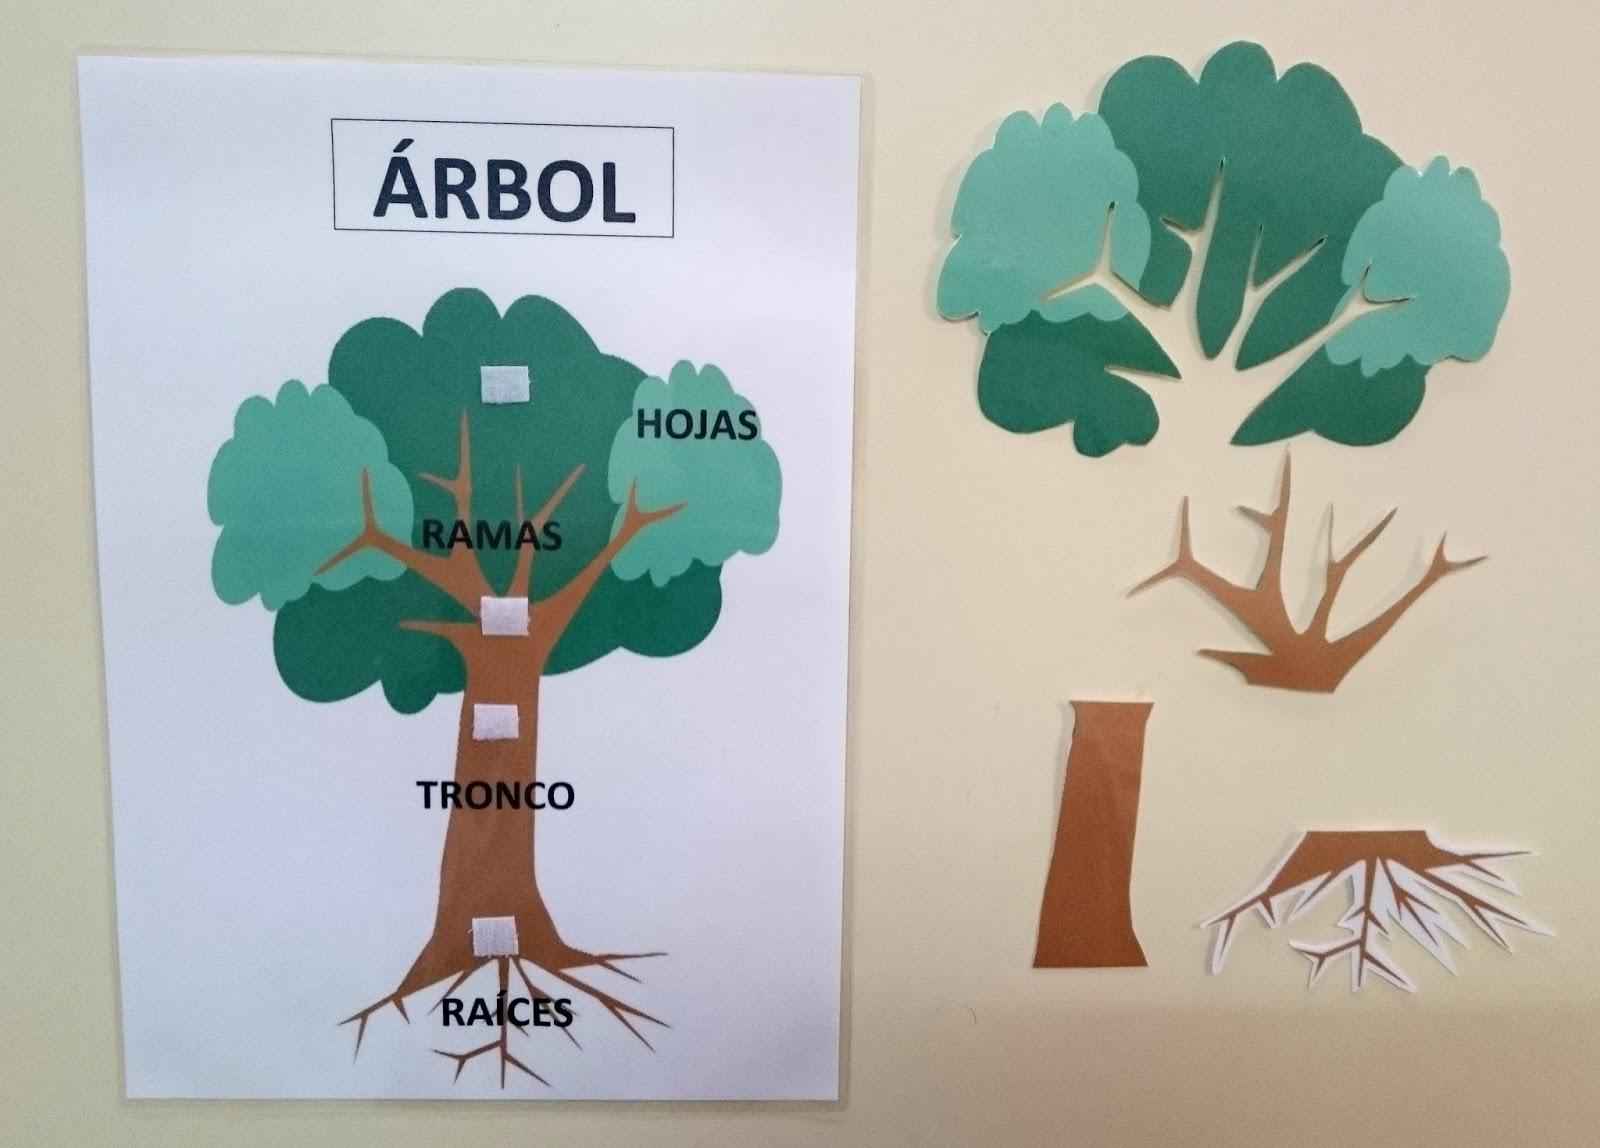 Aula abierta t e a colegio federico de arce mart nez for Un arbol con todas sus partes